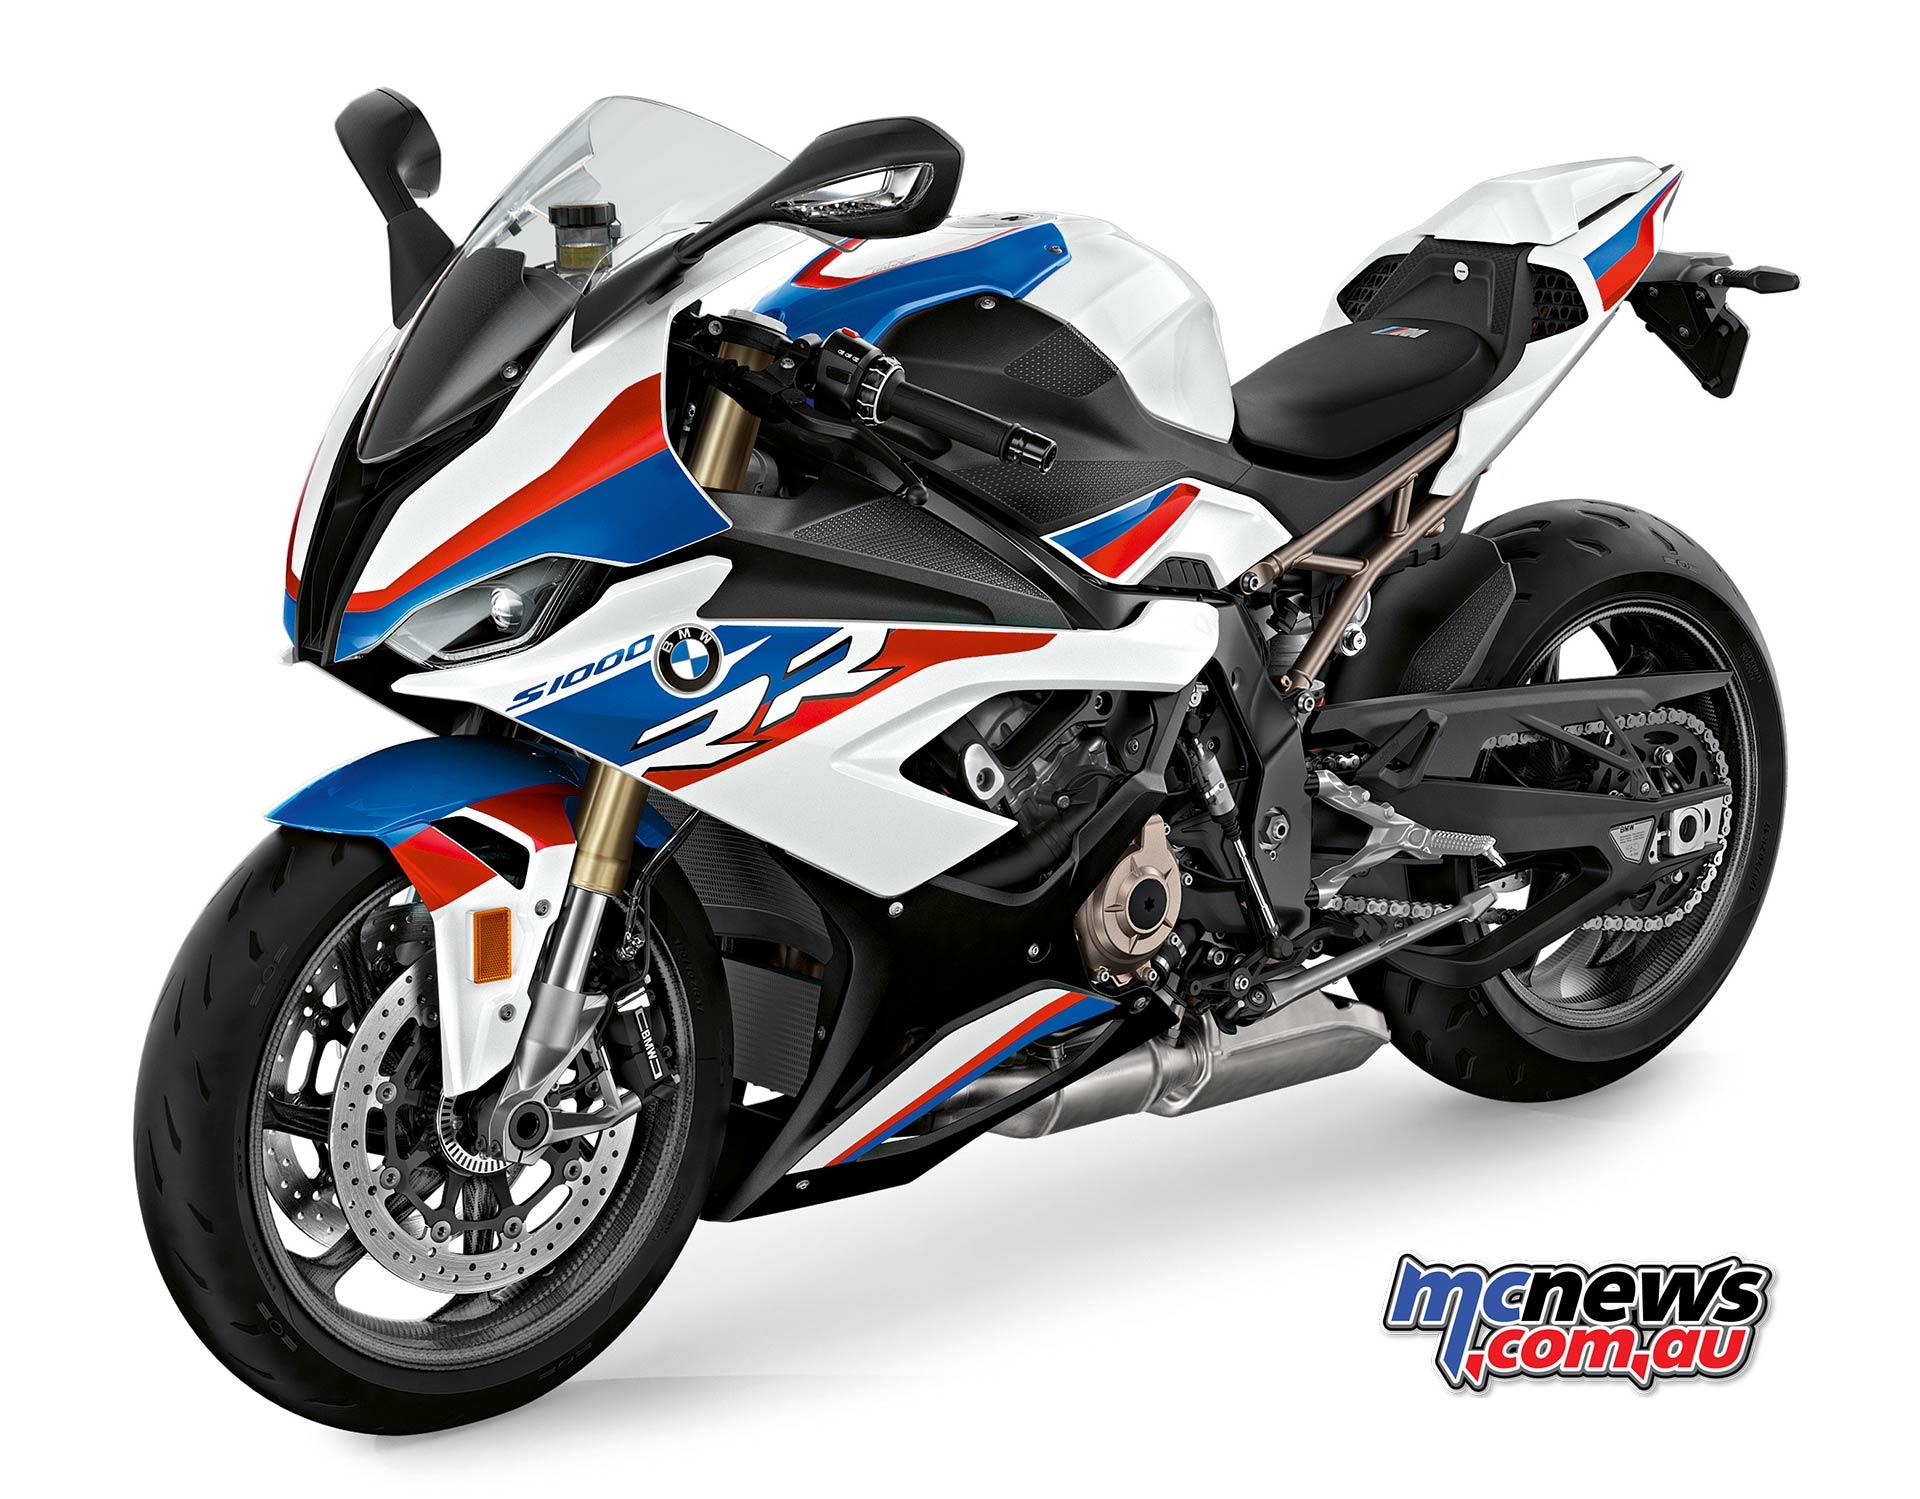 2019 Bmw S 1000 Rr New 207hp Engine 11kg Lighter Mcnews Com Au